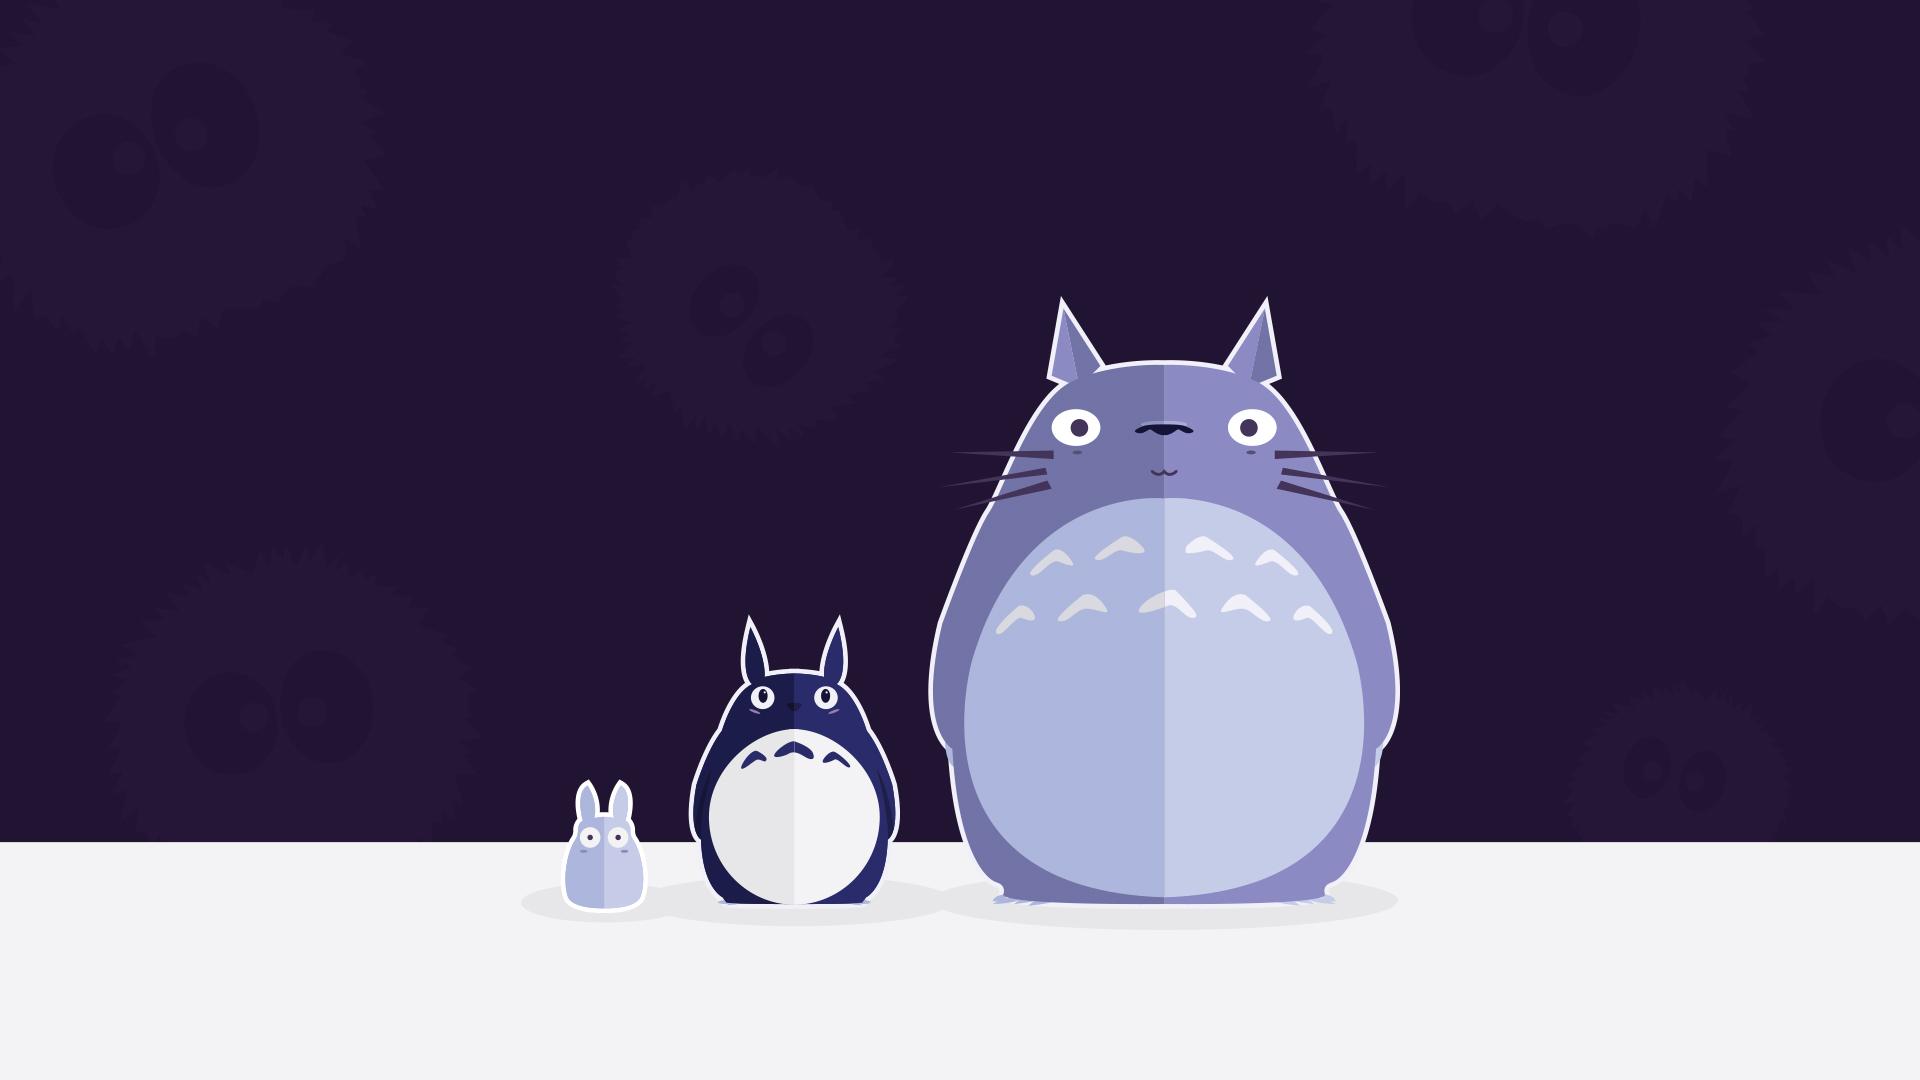 3d Windows Phone Wallpaper Totoro Wallpapers Hd Pixelstalk Net